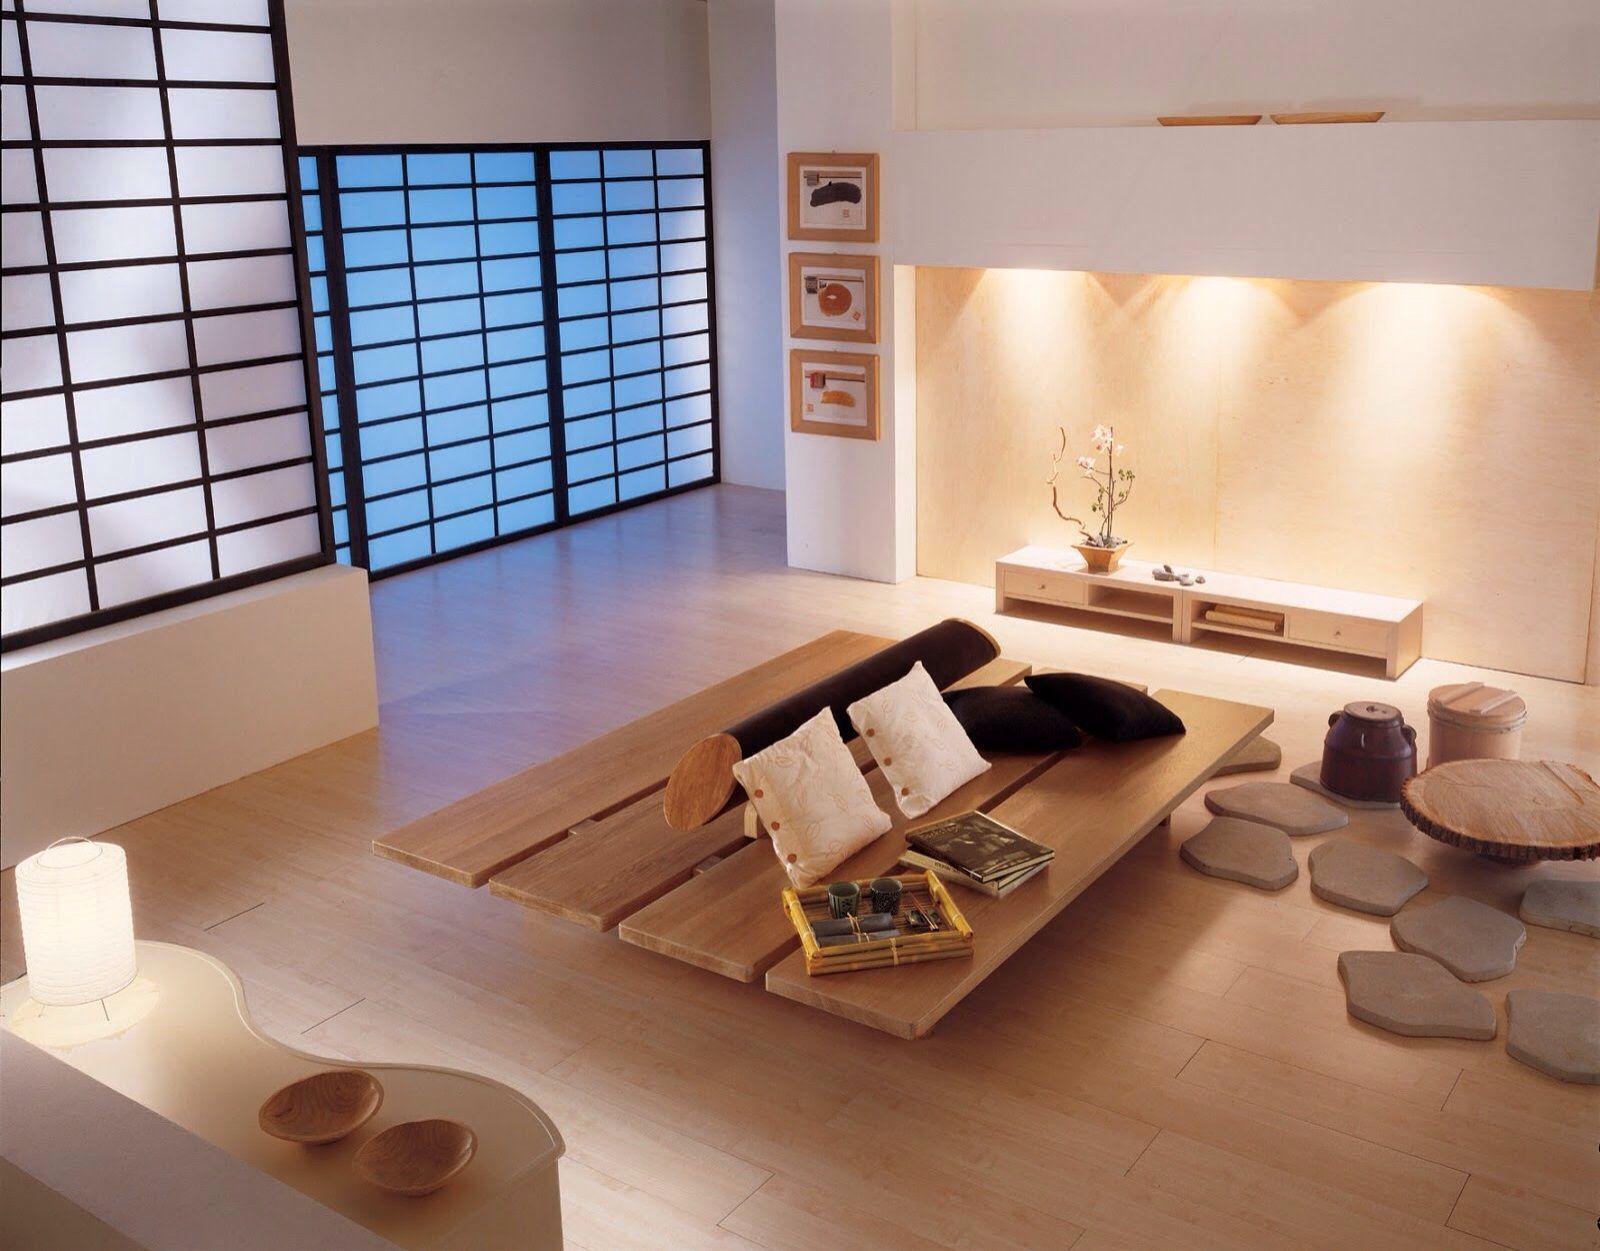 11 magnificent zen interior design ideas | zen interiors, japanese